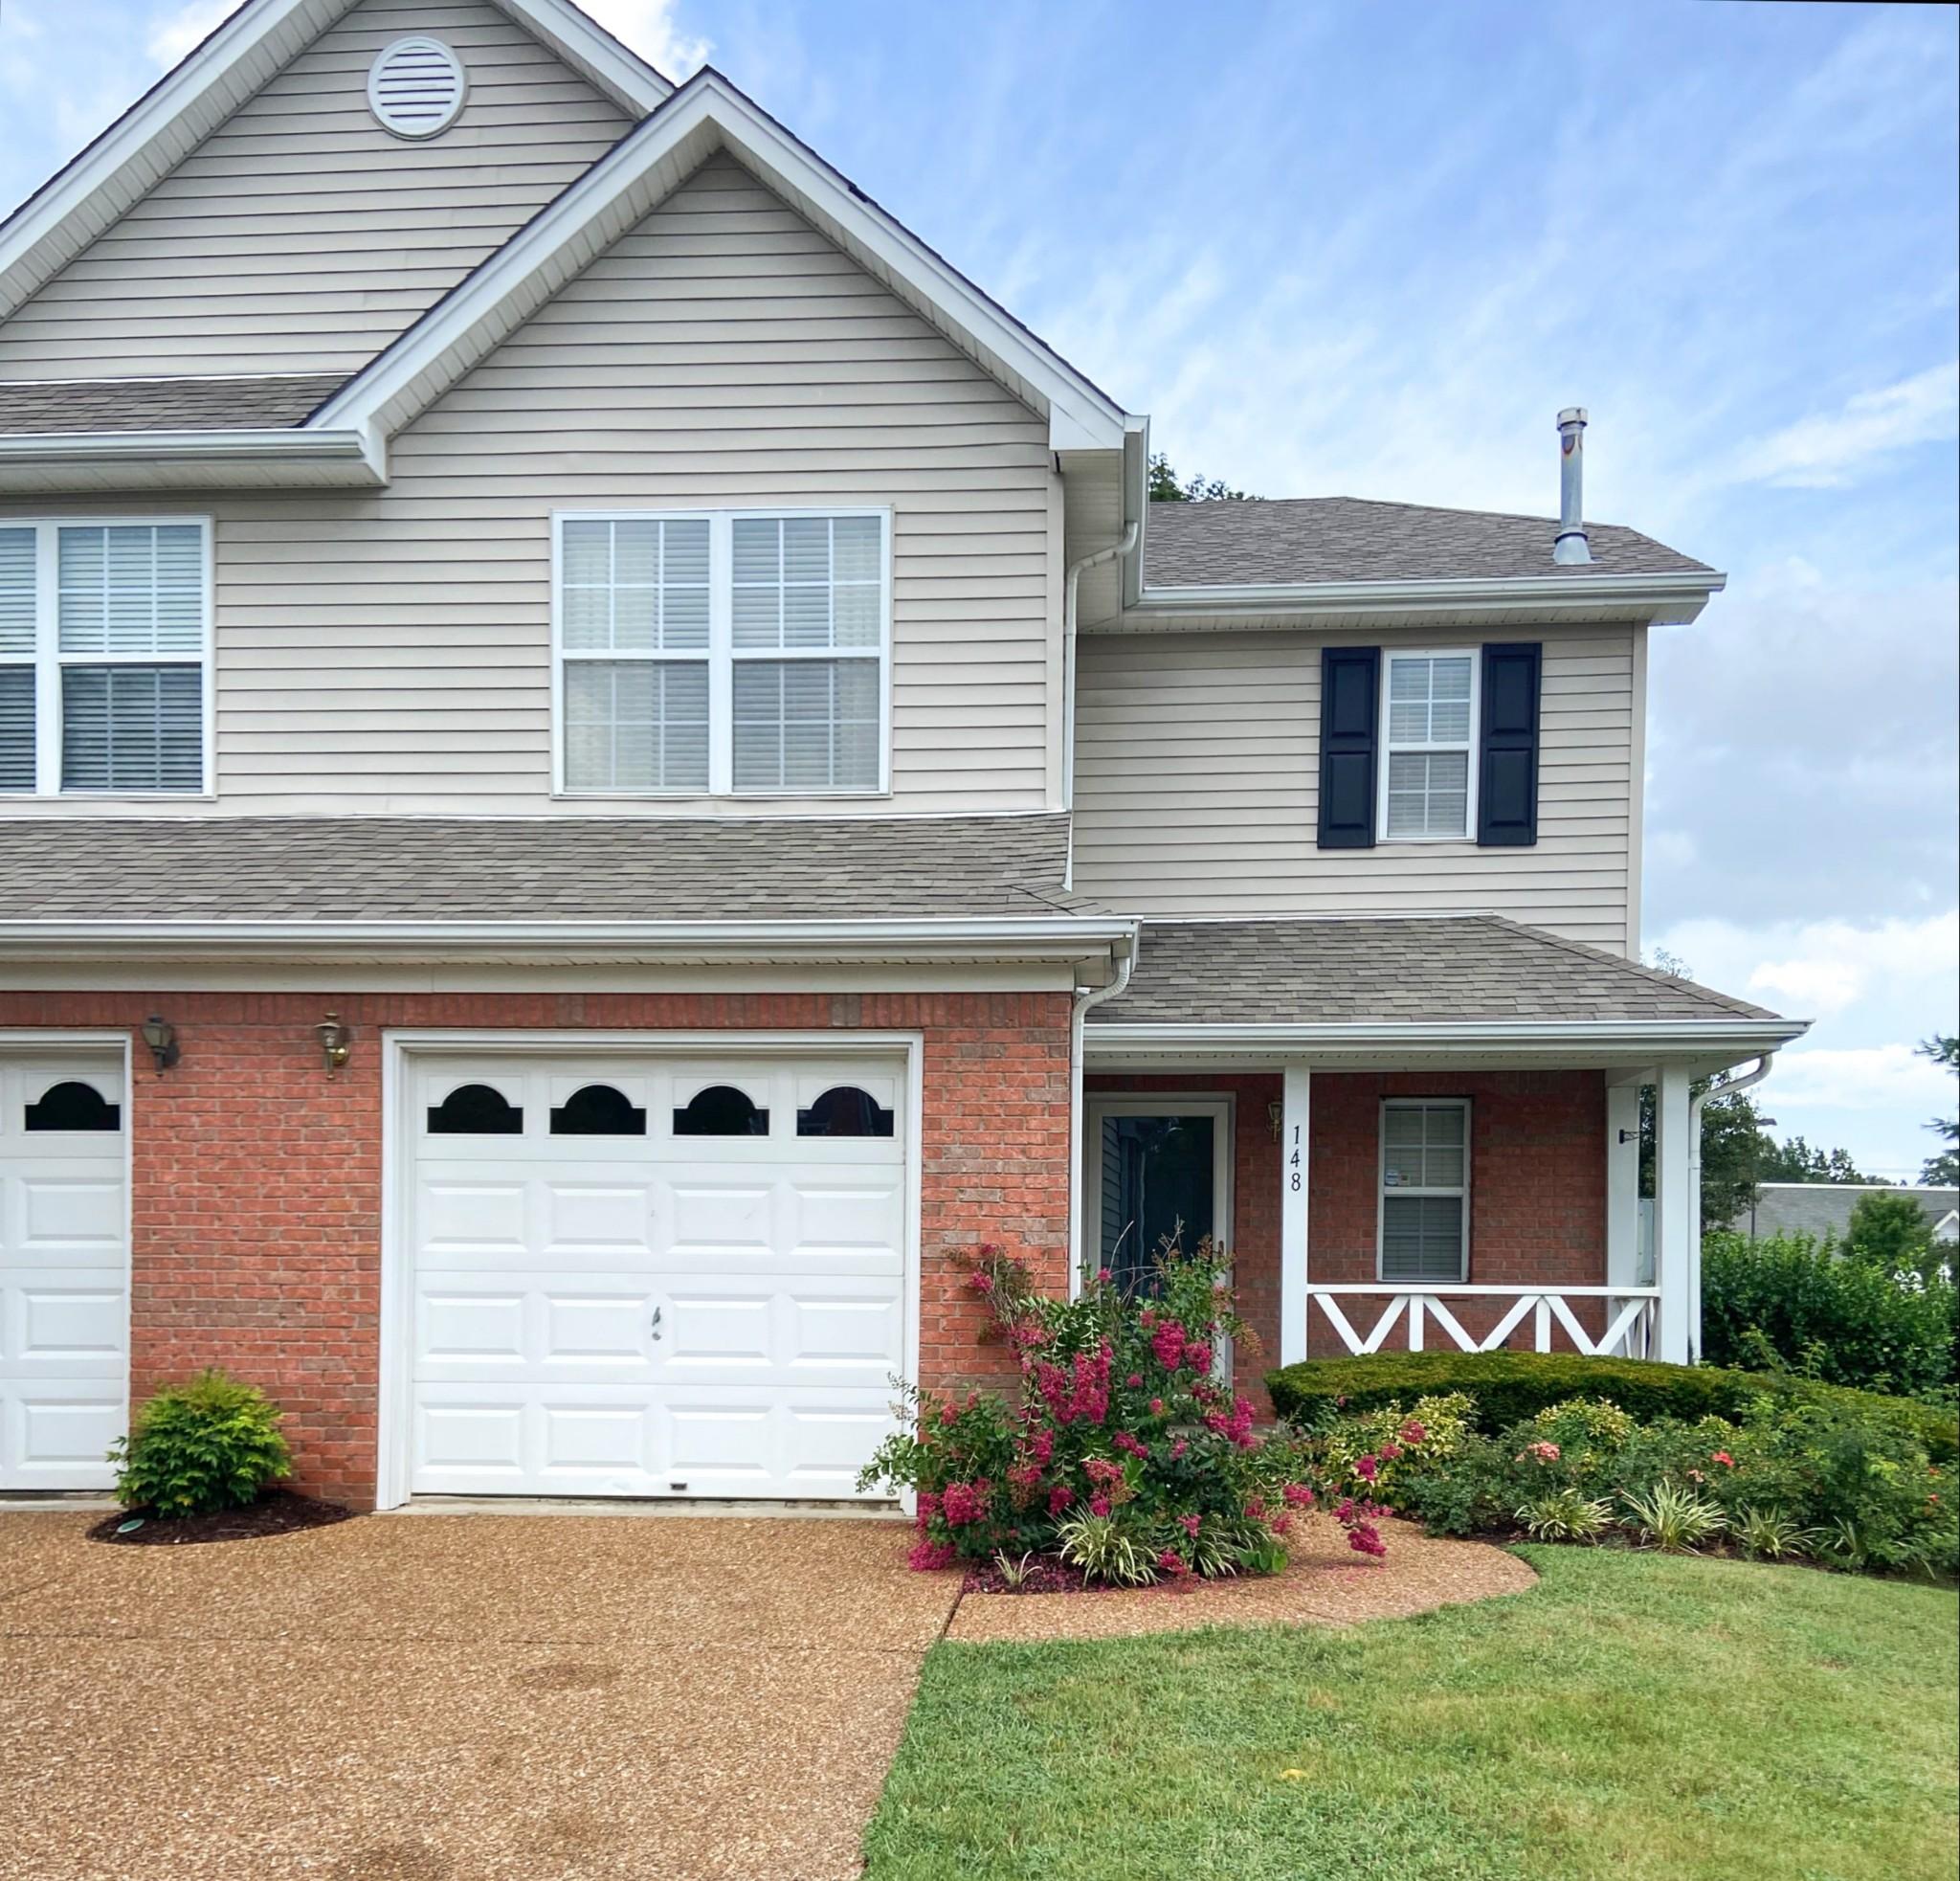 148 Stanton Hall Ln Property Photo - Franklin, TN real estate listing